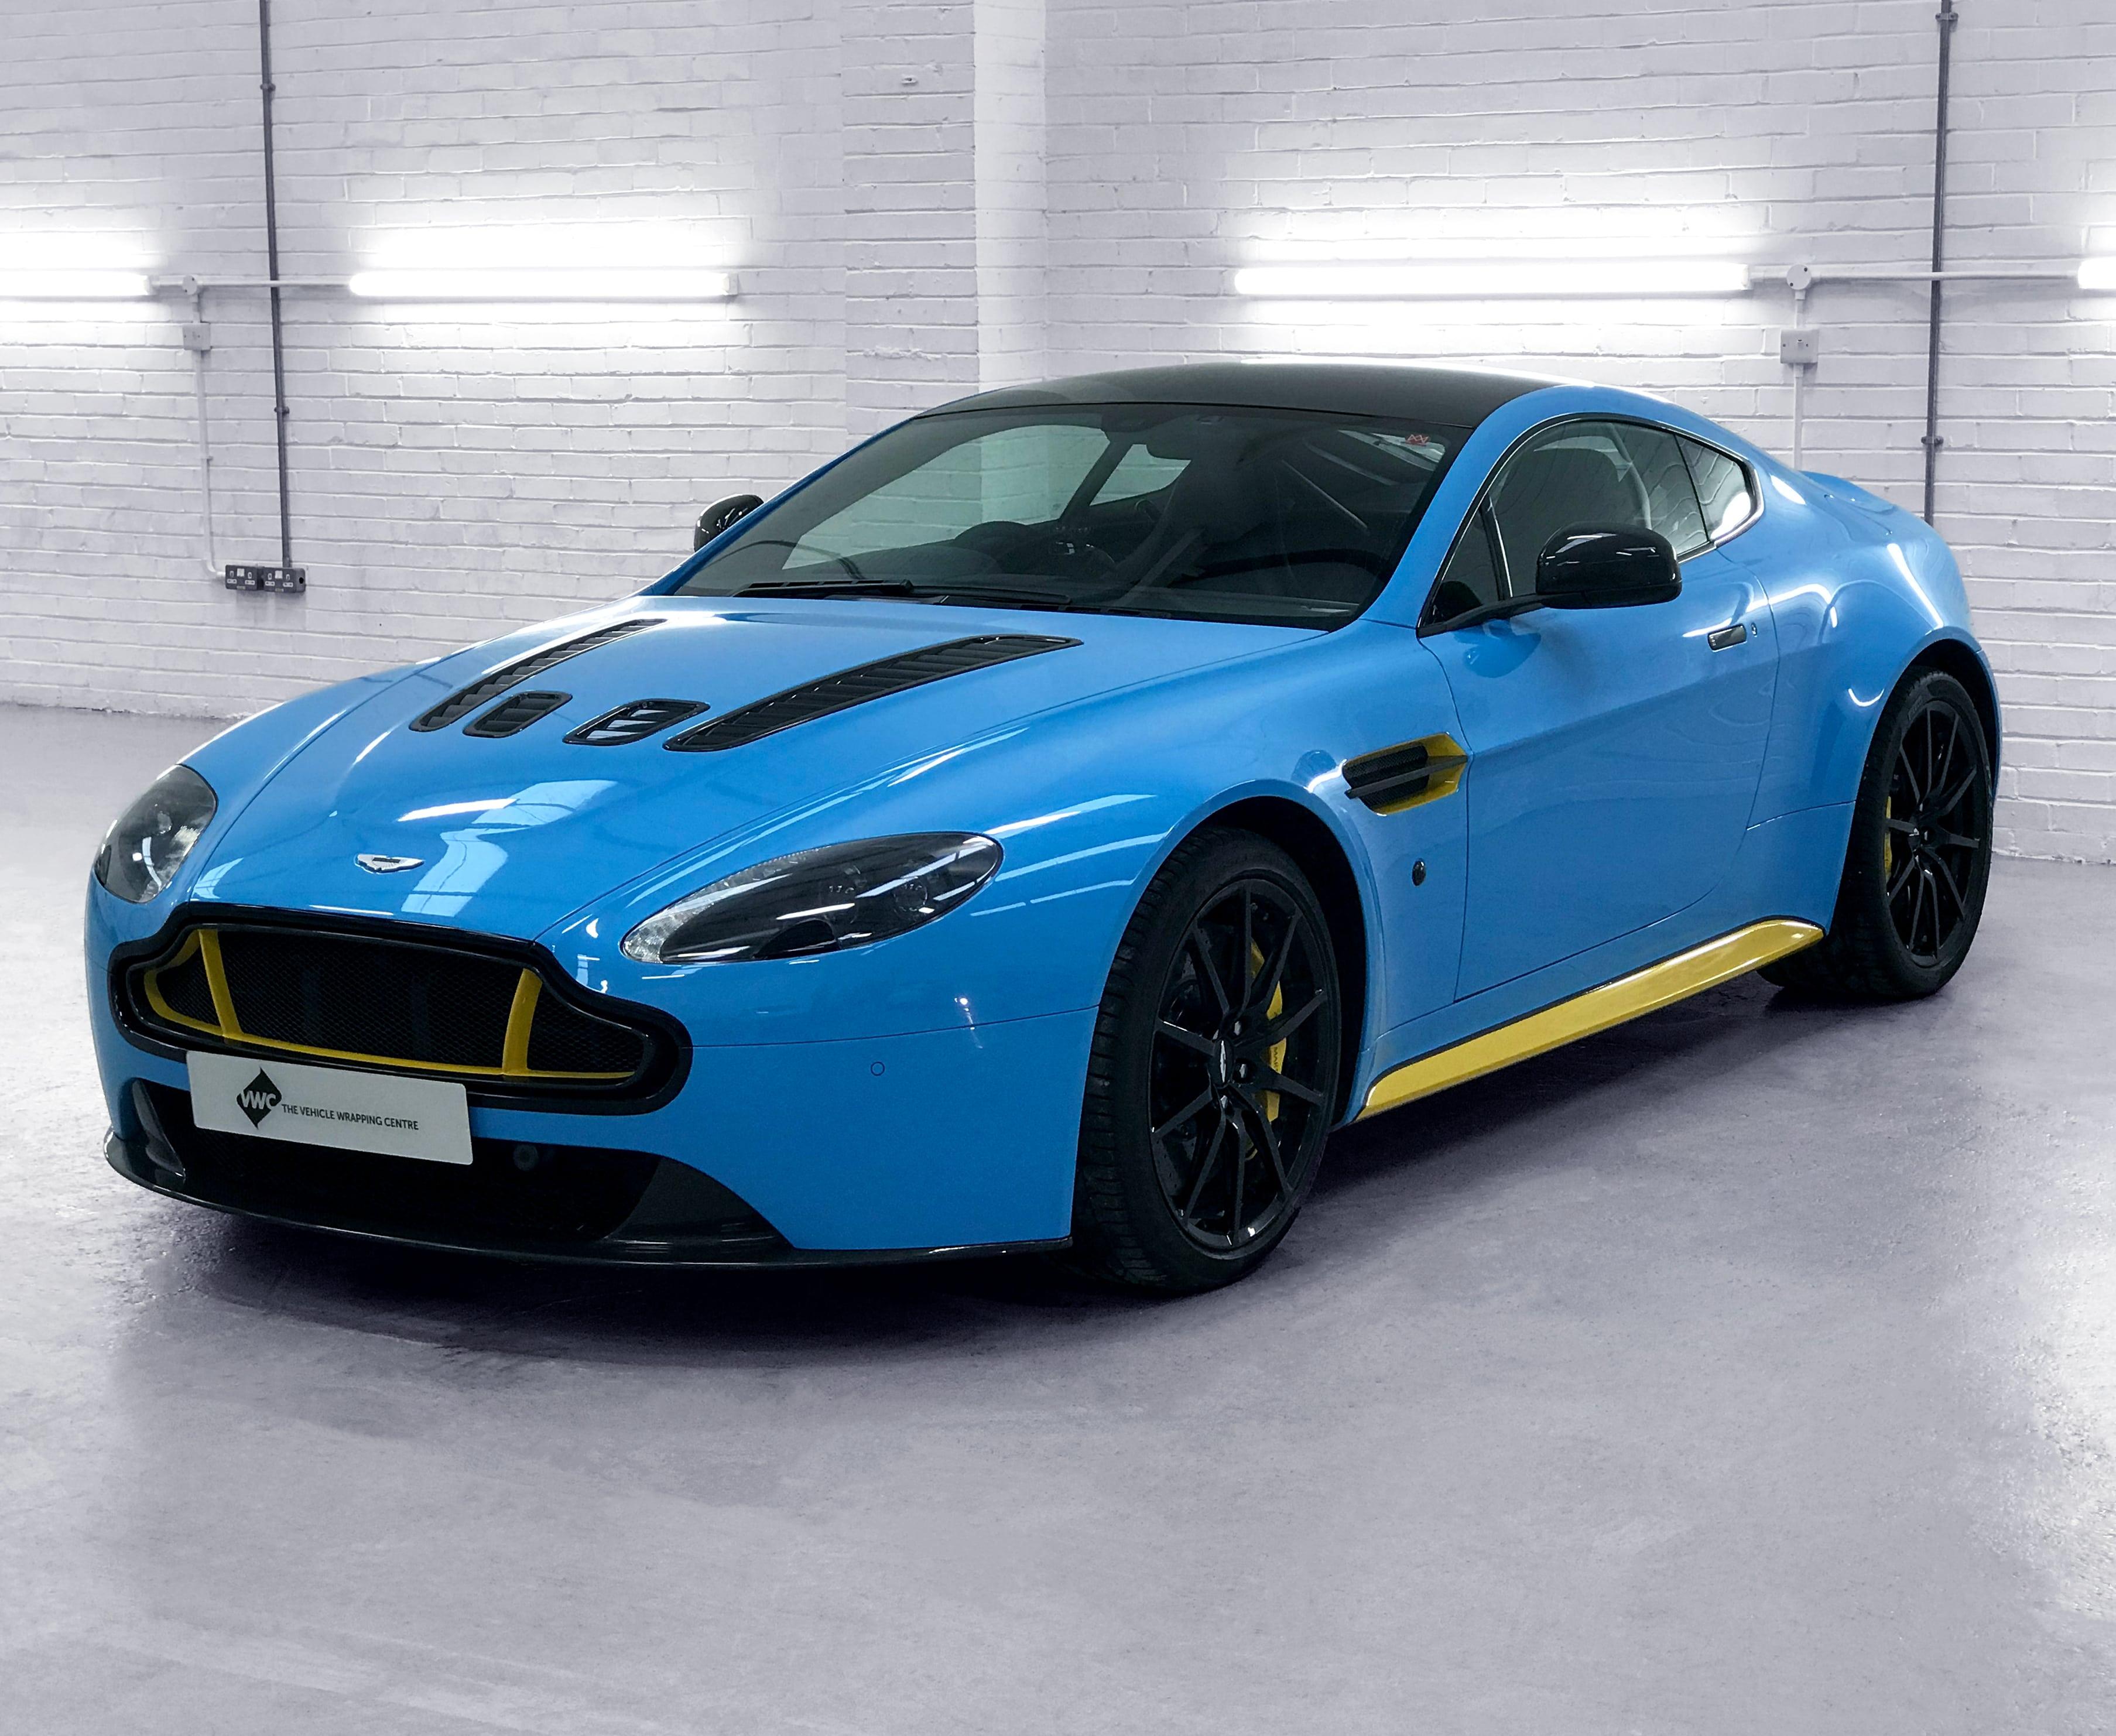 Aston Martin V12 Vantage Hexis Gloss Yellow Personal